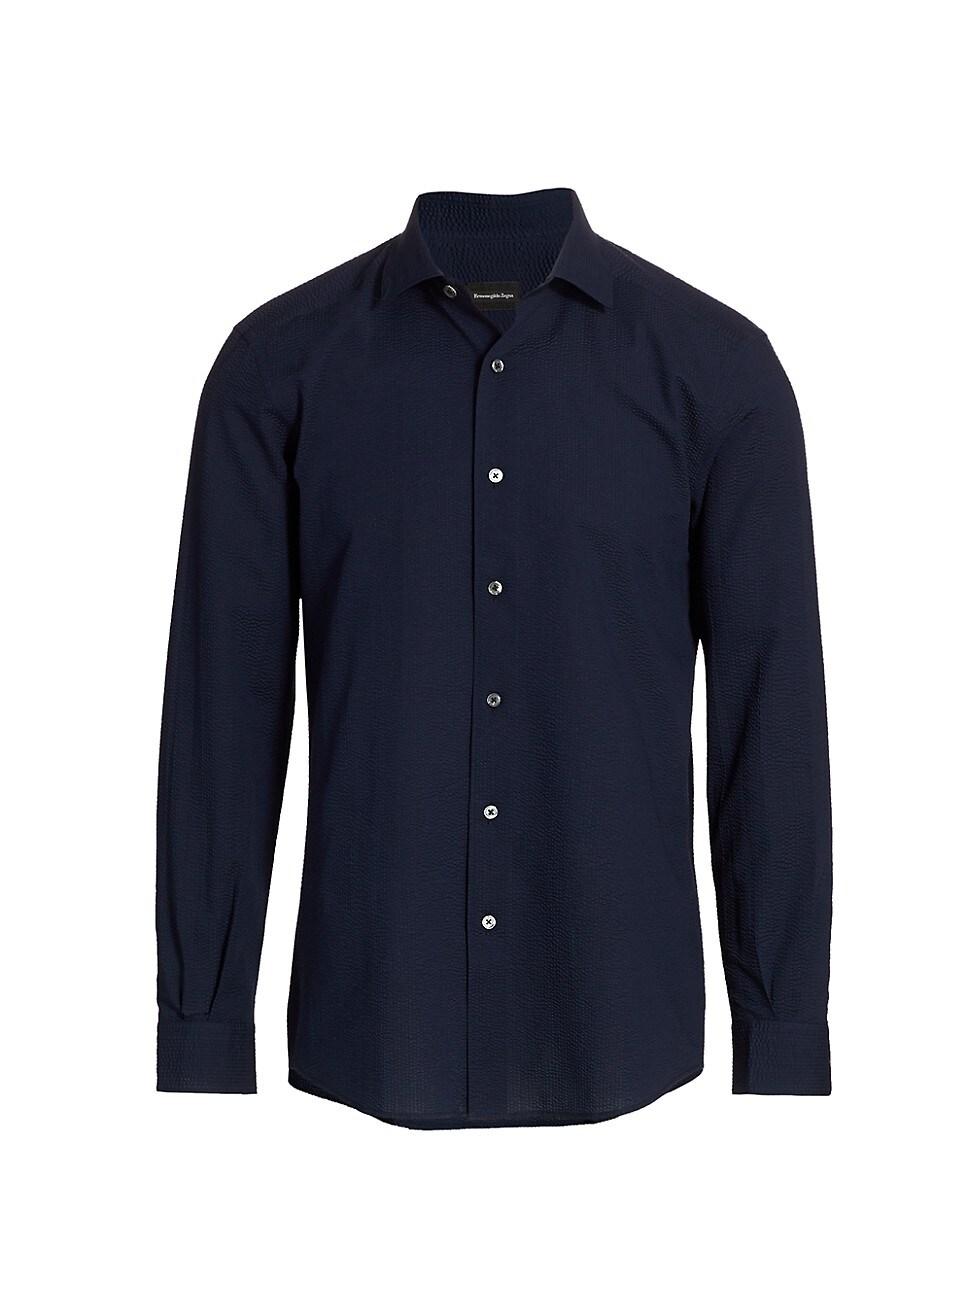 Ermenegildo Zegna Seersucker Button-up Shirt In Navy